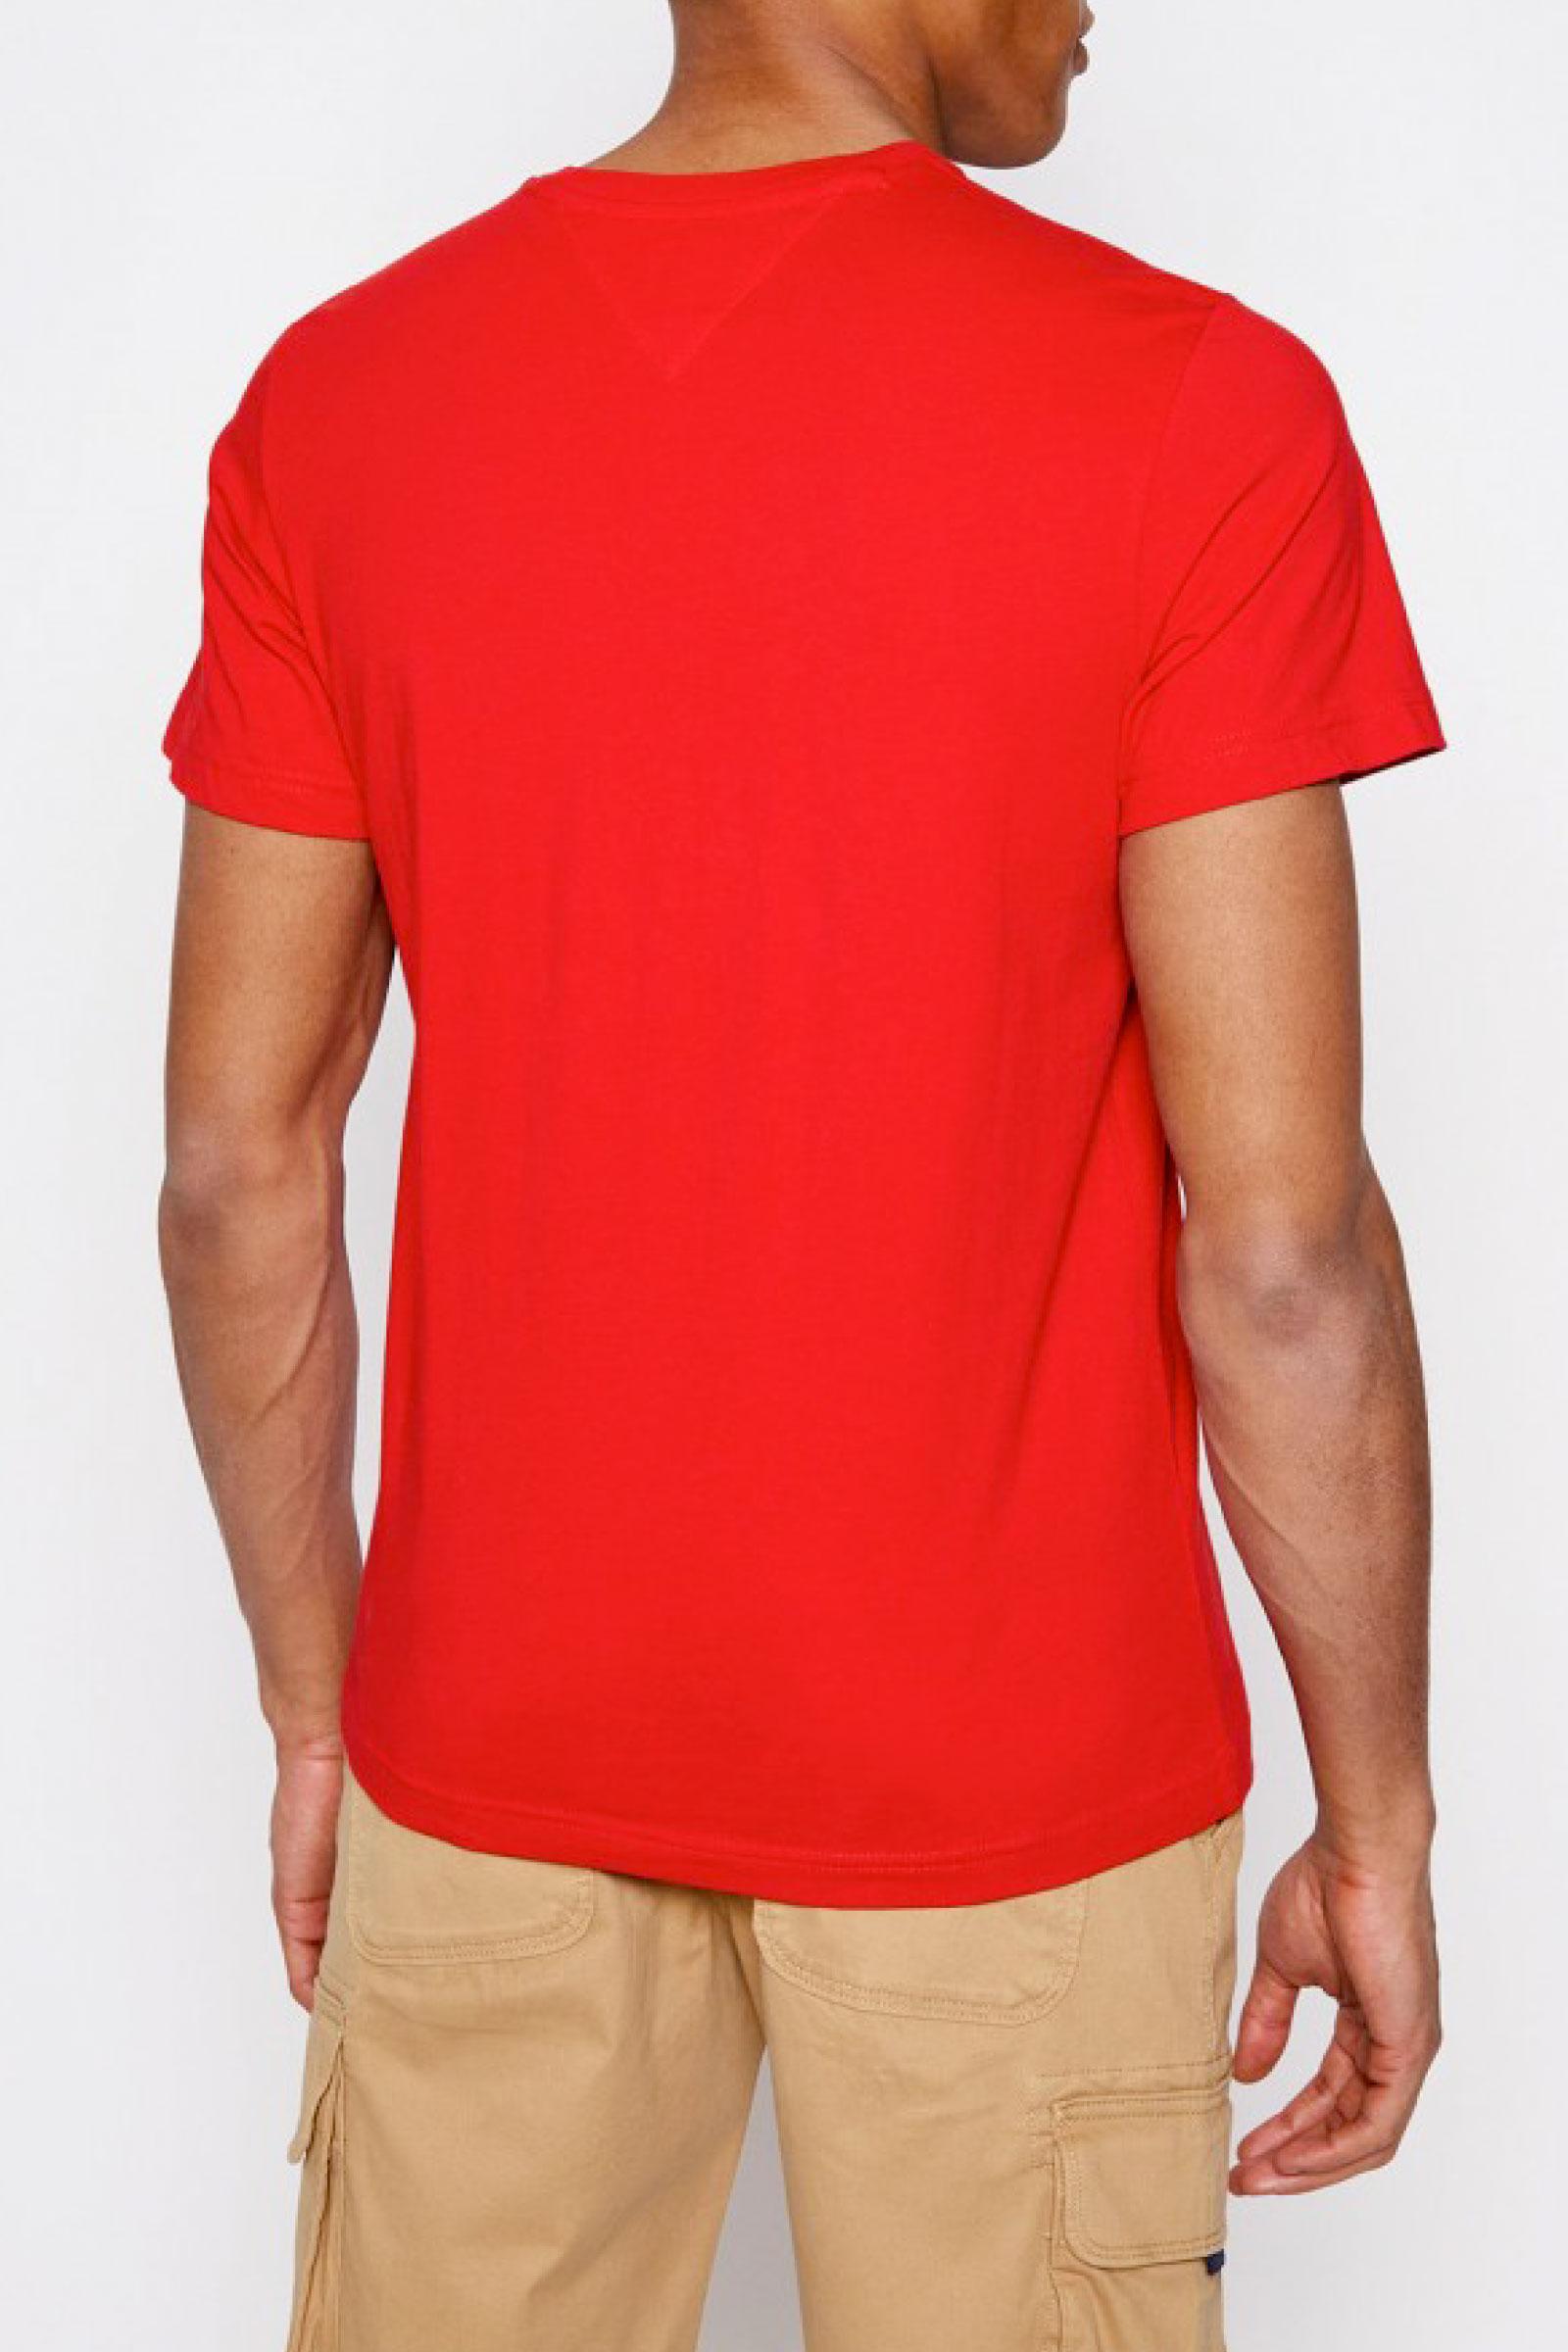 TOMMY JEANS T-Shirt Uomo TOMMY JEANS | T-Shirt | DM0DM10101XNL